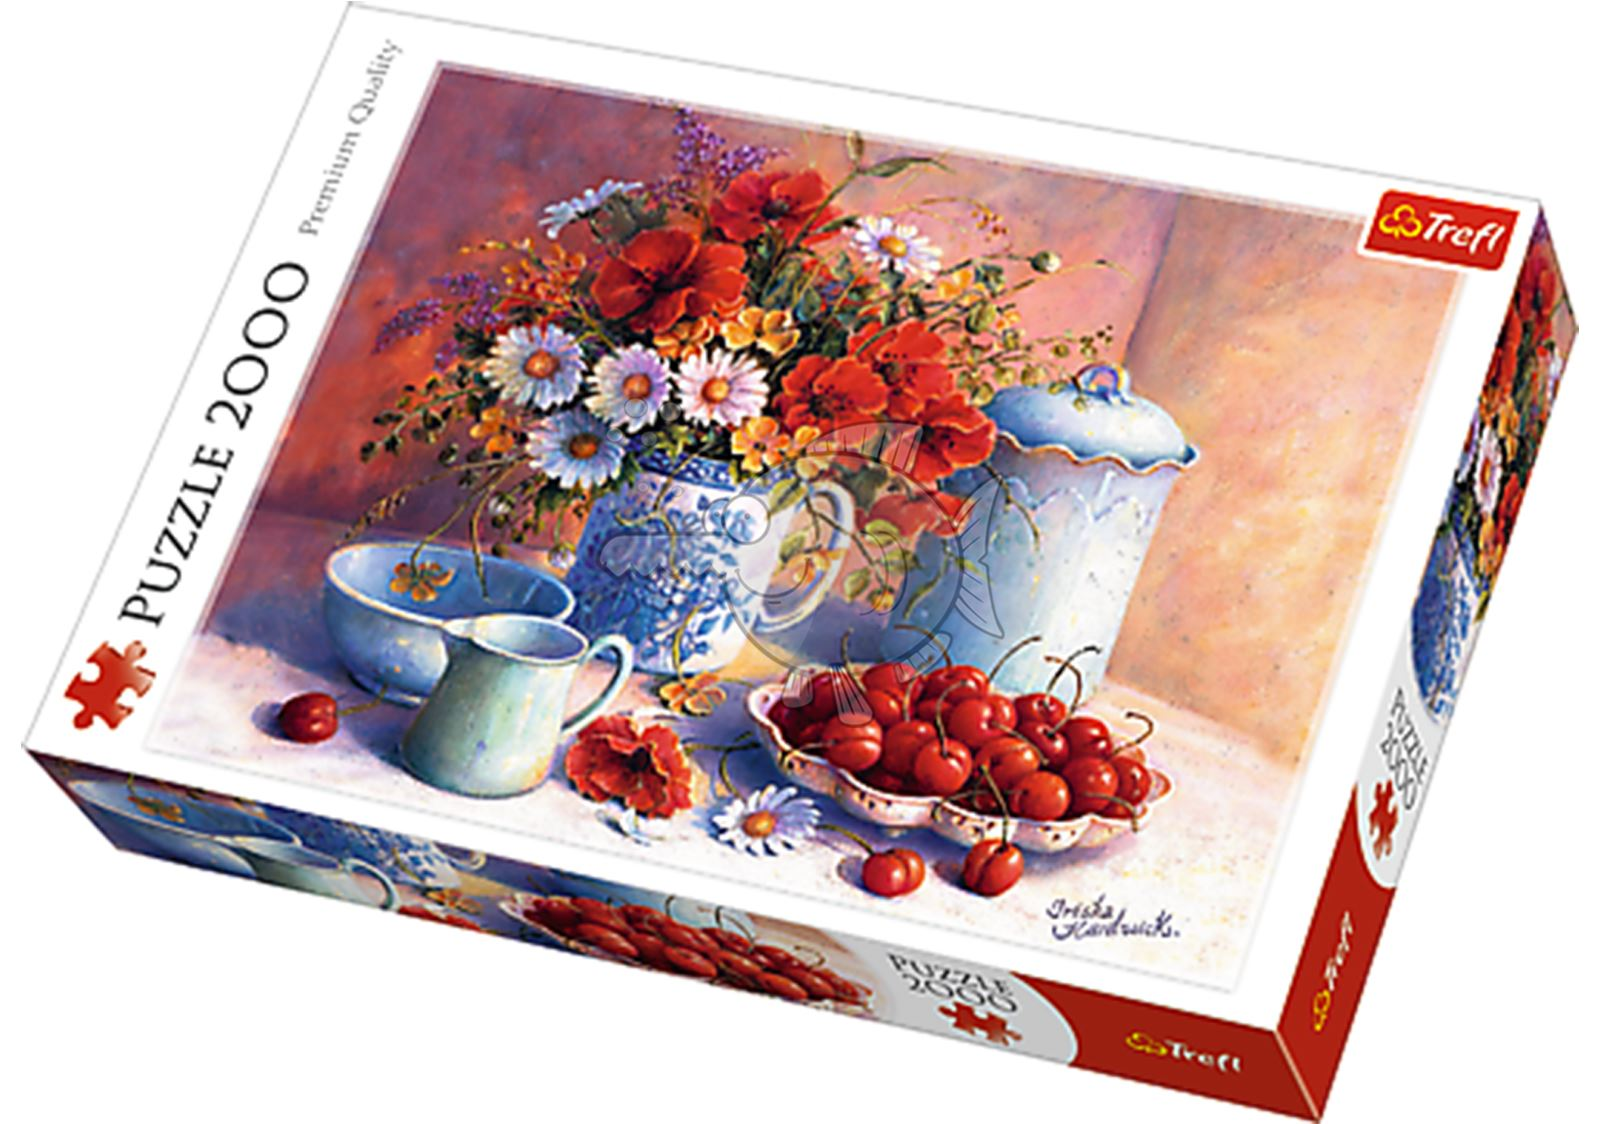 Trefl-300-500-1000-1500-2000-3000-4000-6000-Piece-Jigsaw-Puzzle-Landscapes-City thumbnail 366